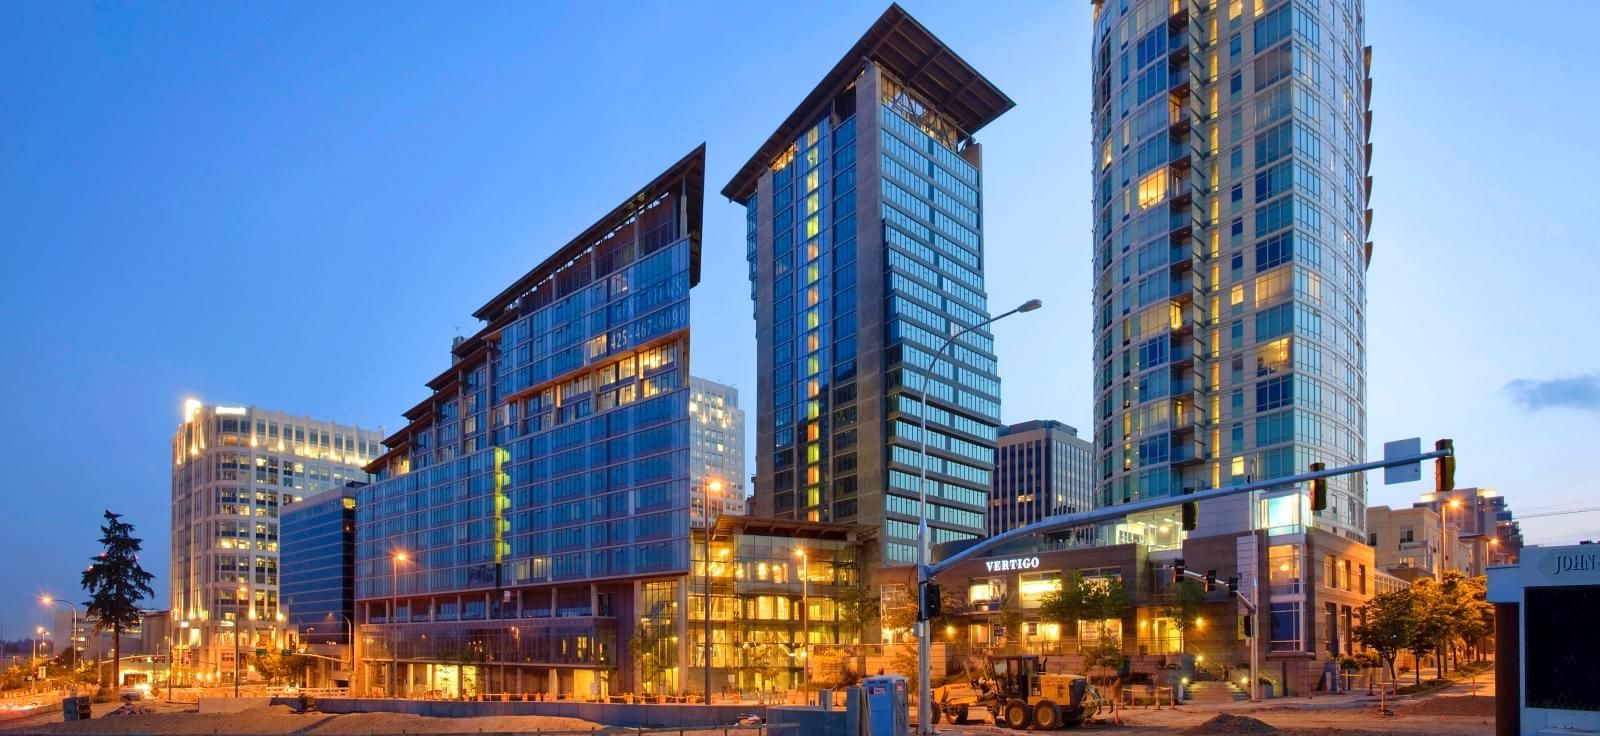 Elements Apartments In Bellevue Washington